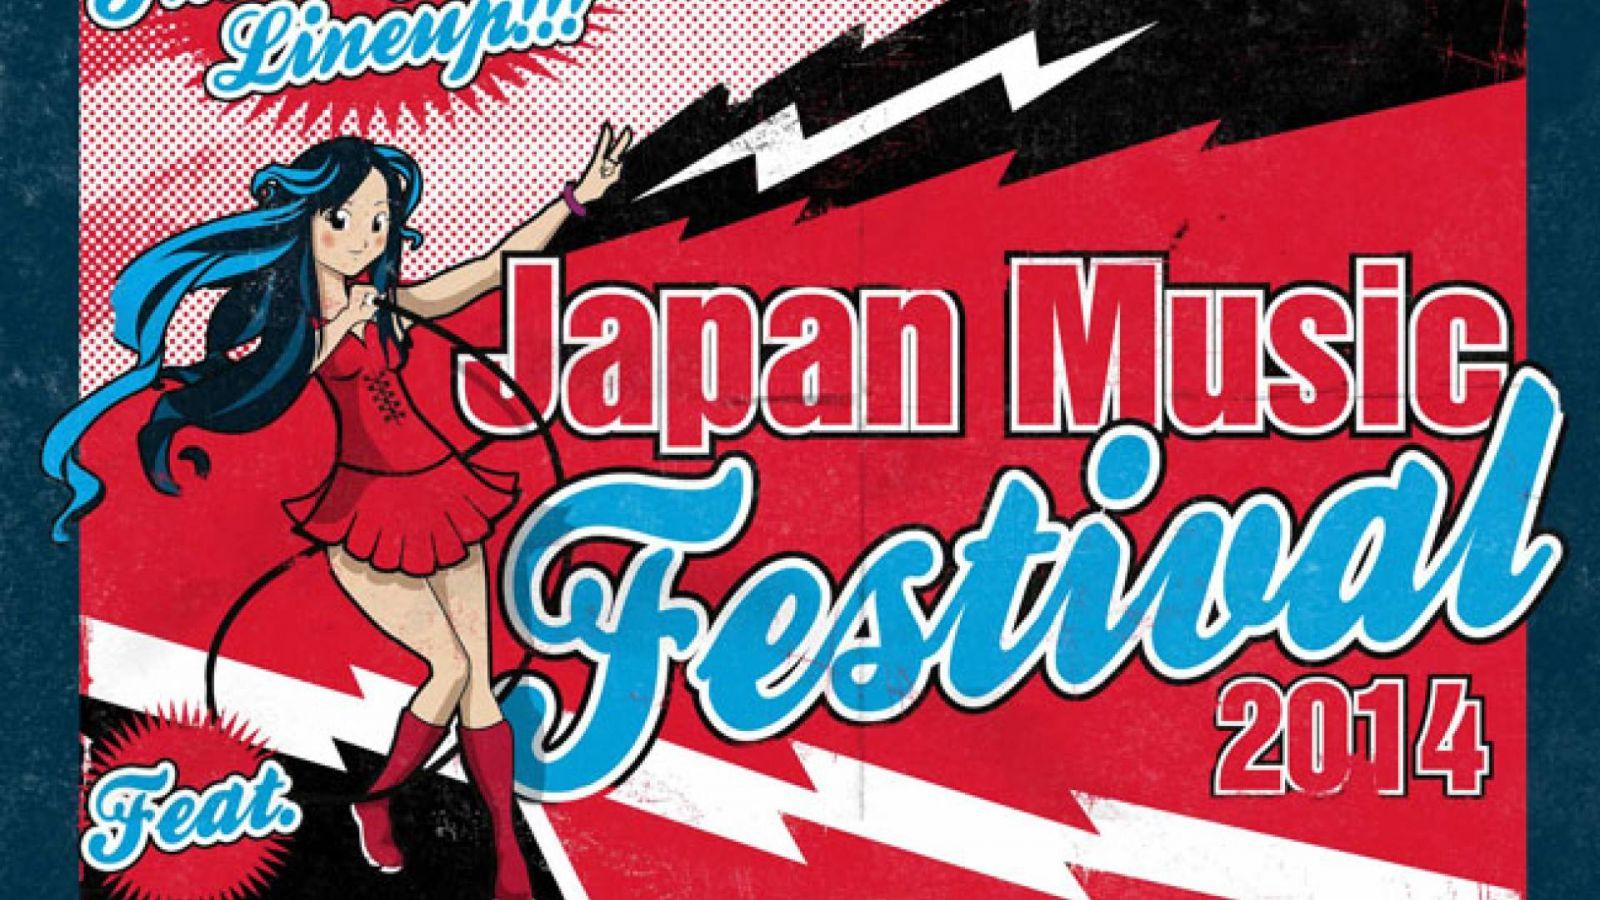 Japan Music Festival 2014 © Japan Music Festival